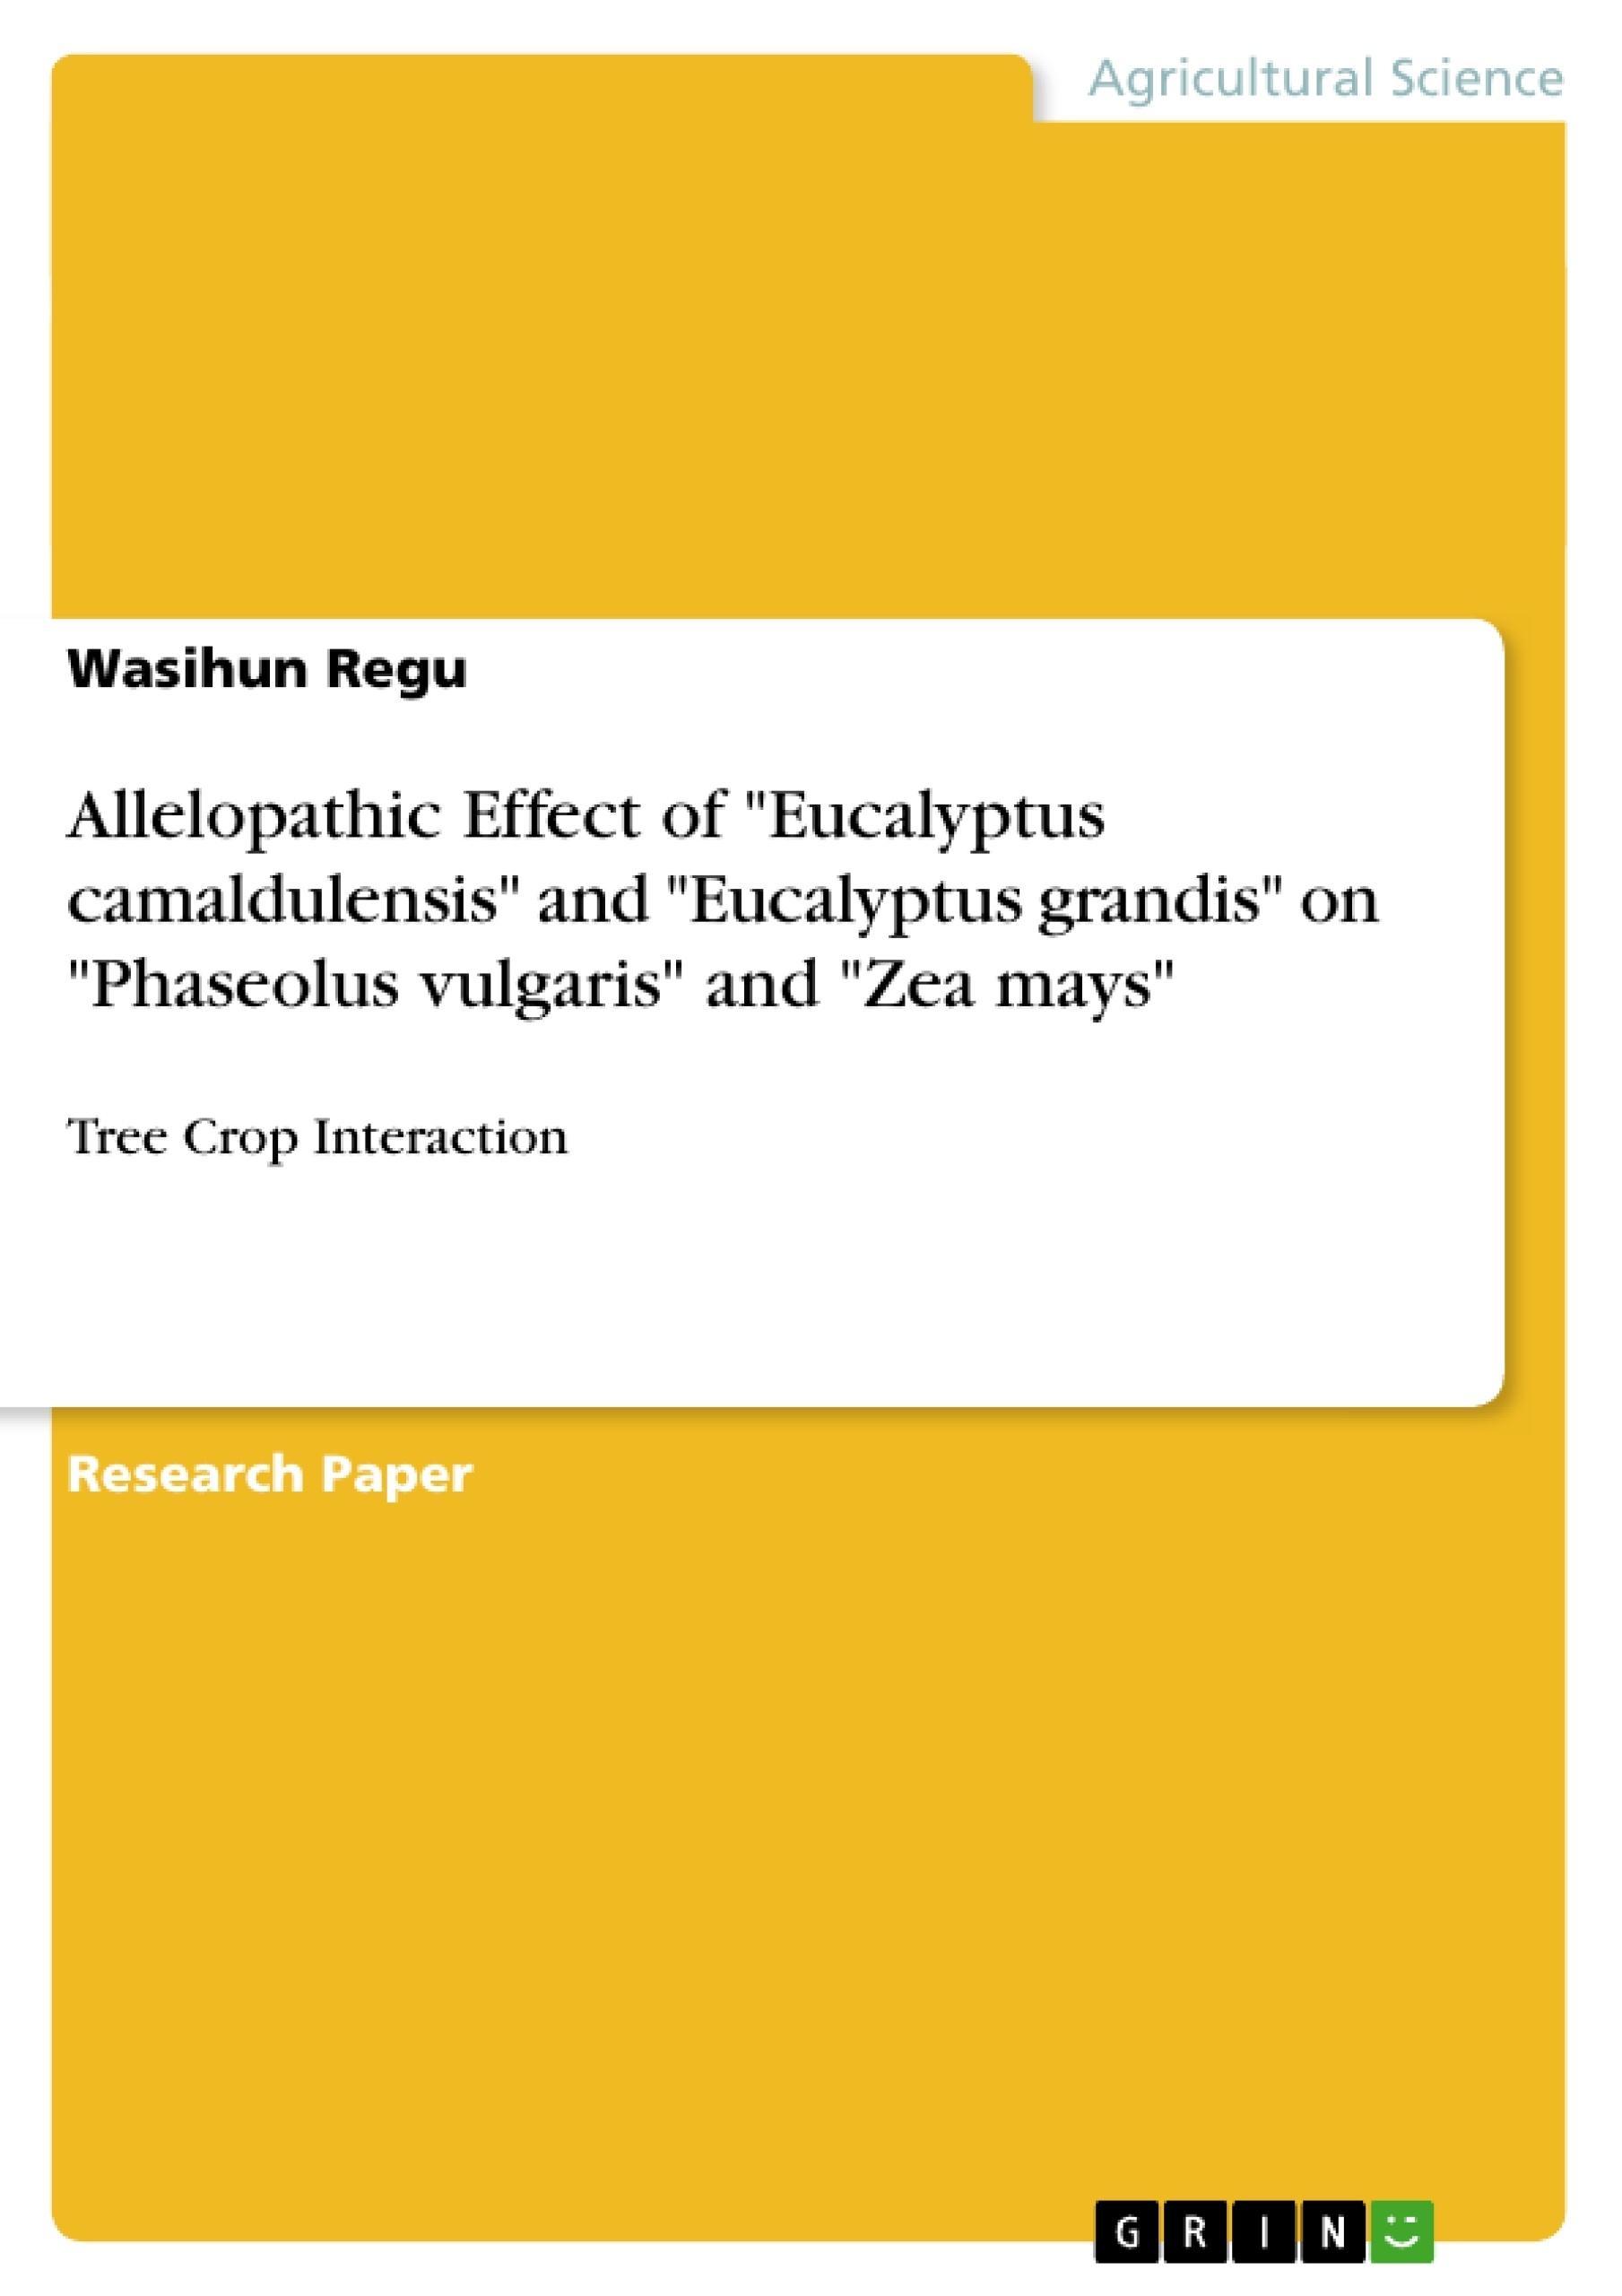 "Title: Allelopathic Effect of ""Eucalyptus camaldulensis"" and ""Eucalyptus grandis"" on ""Phaseolus vulgaris"" and ""Zea mays"""